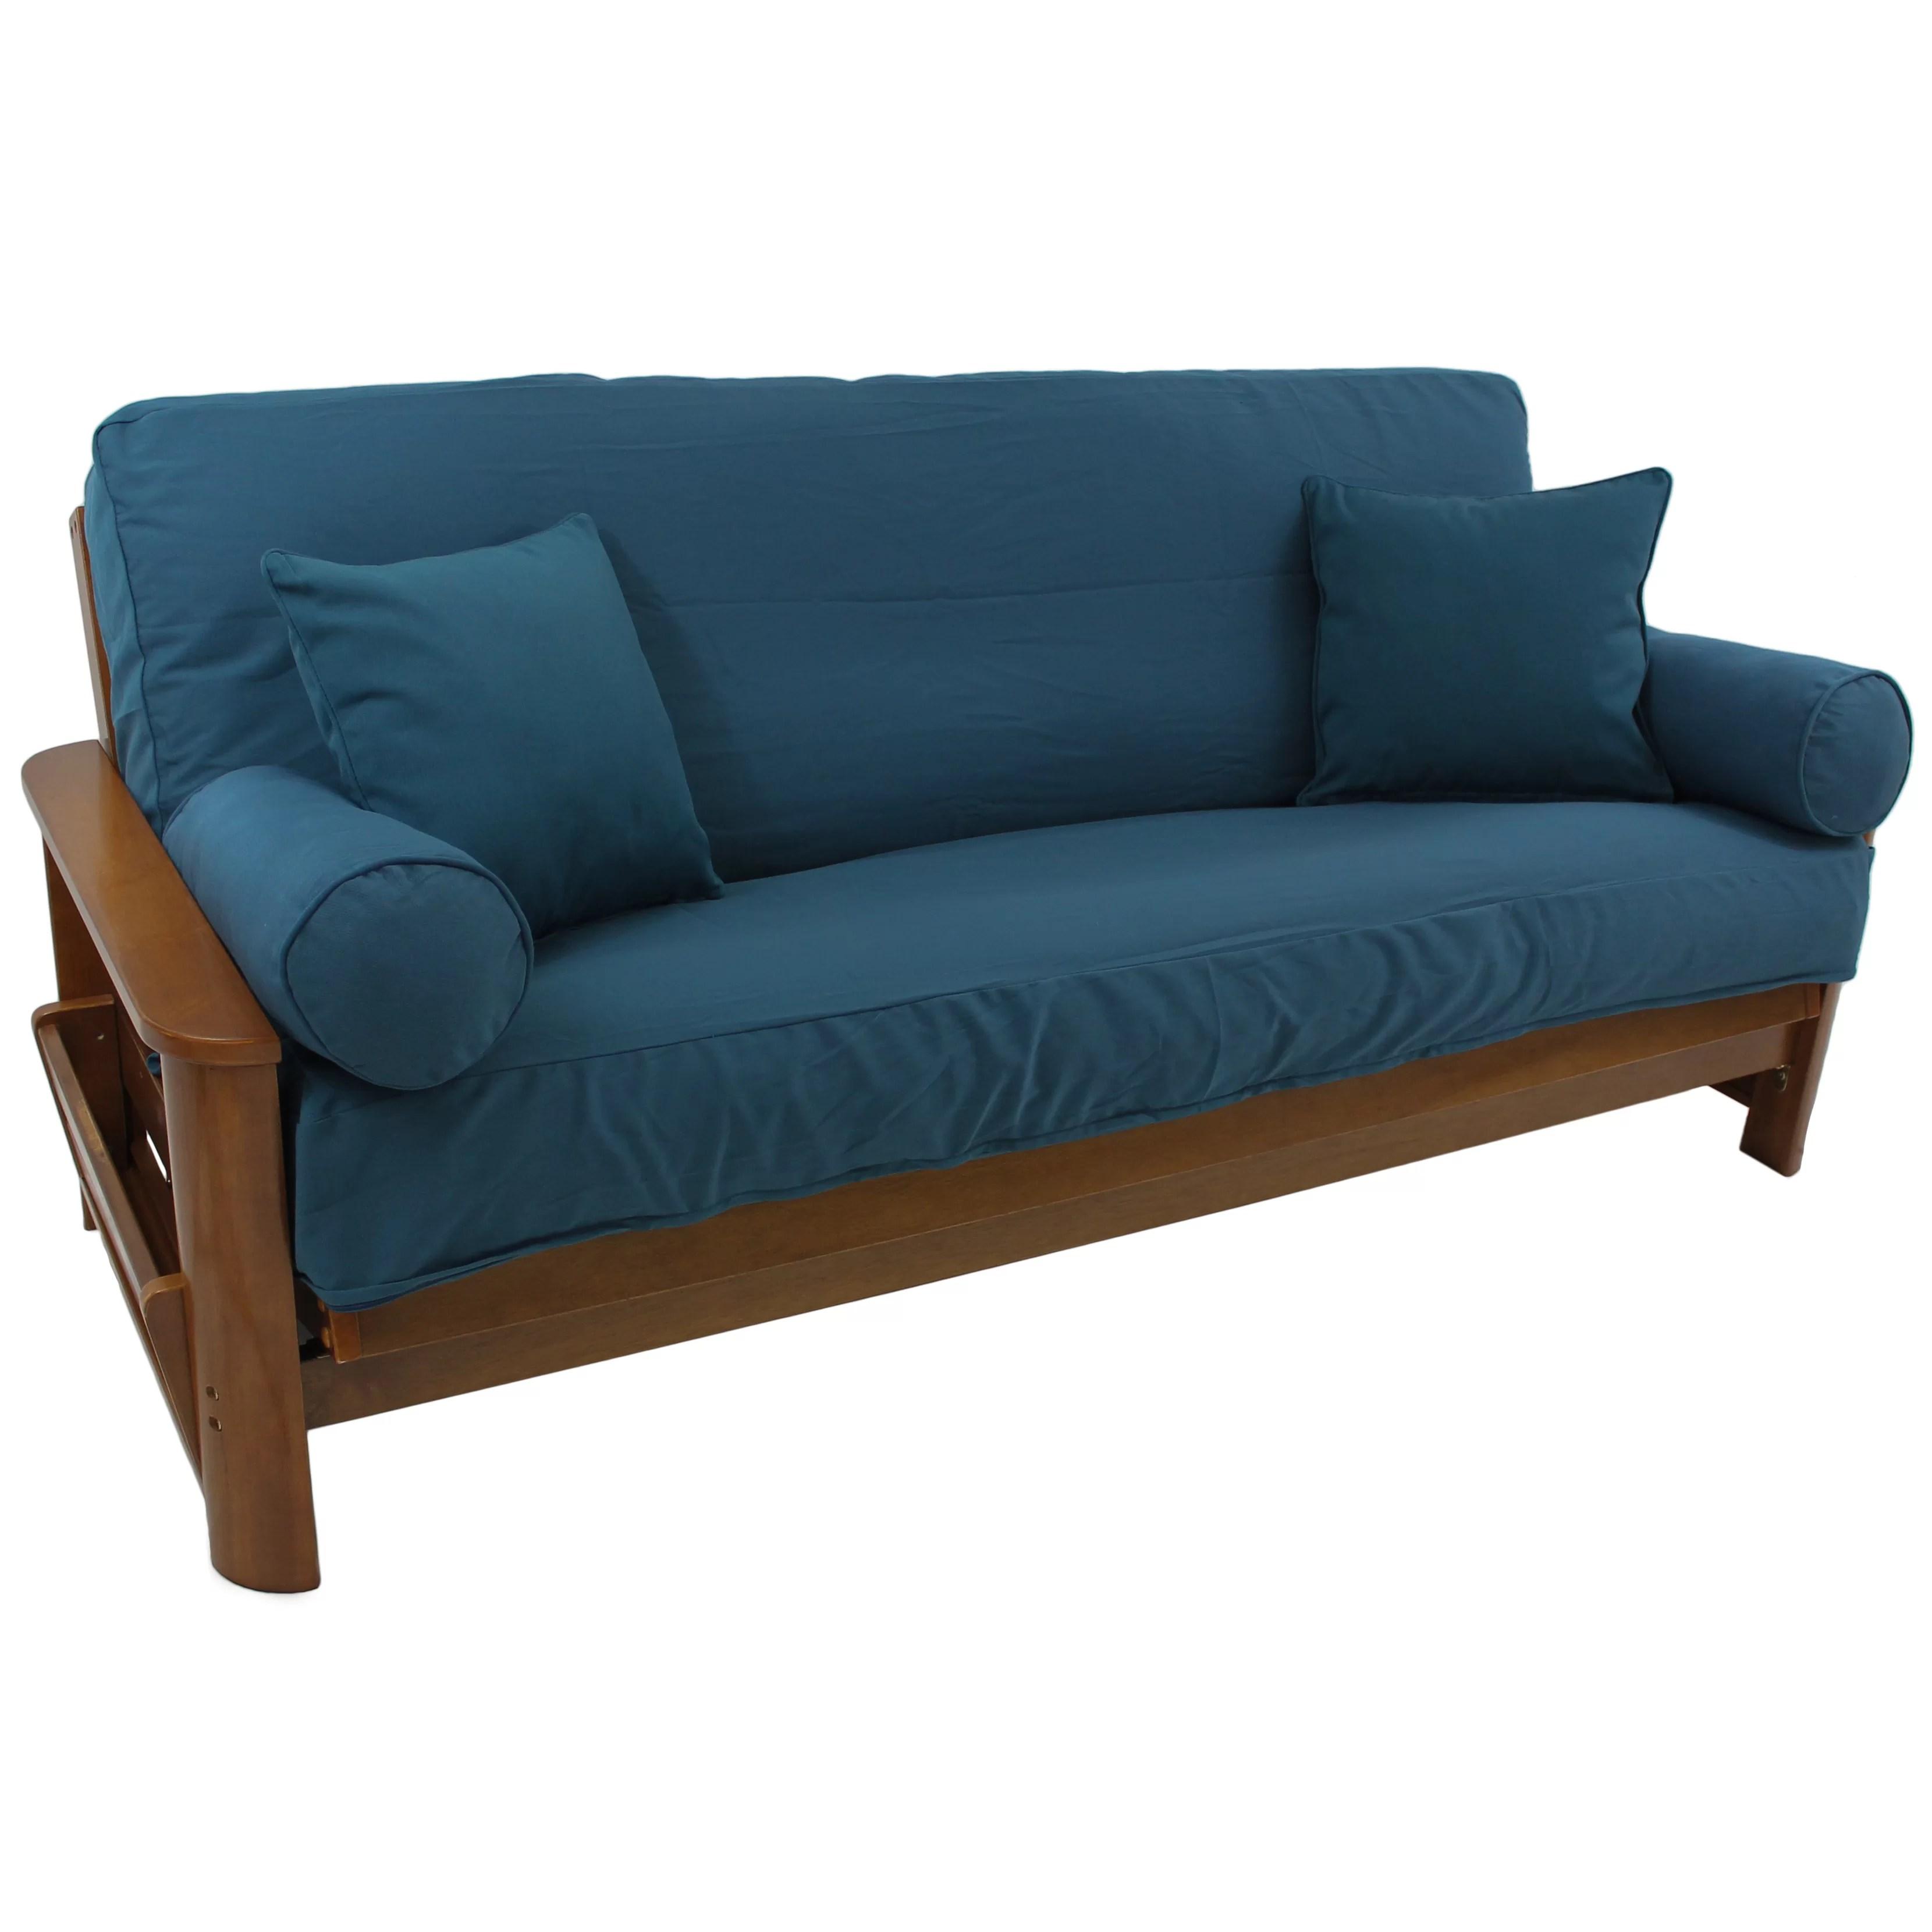 overstock sofa covers lane reclining sofas reviews blazing needles 5 piece futon slipcover set and